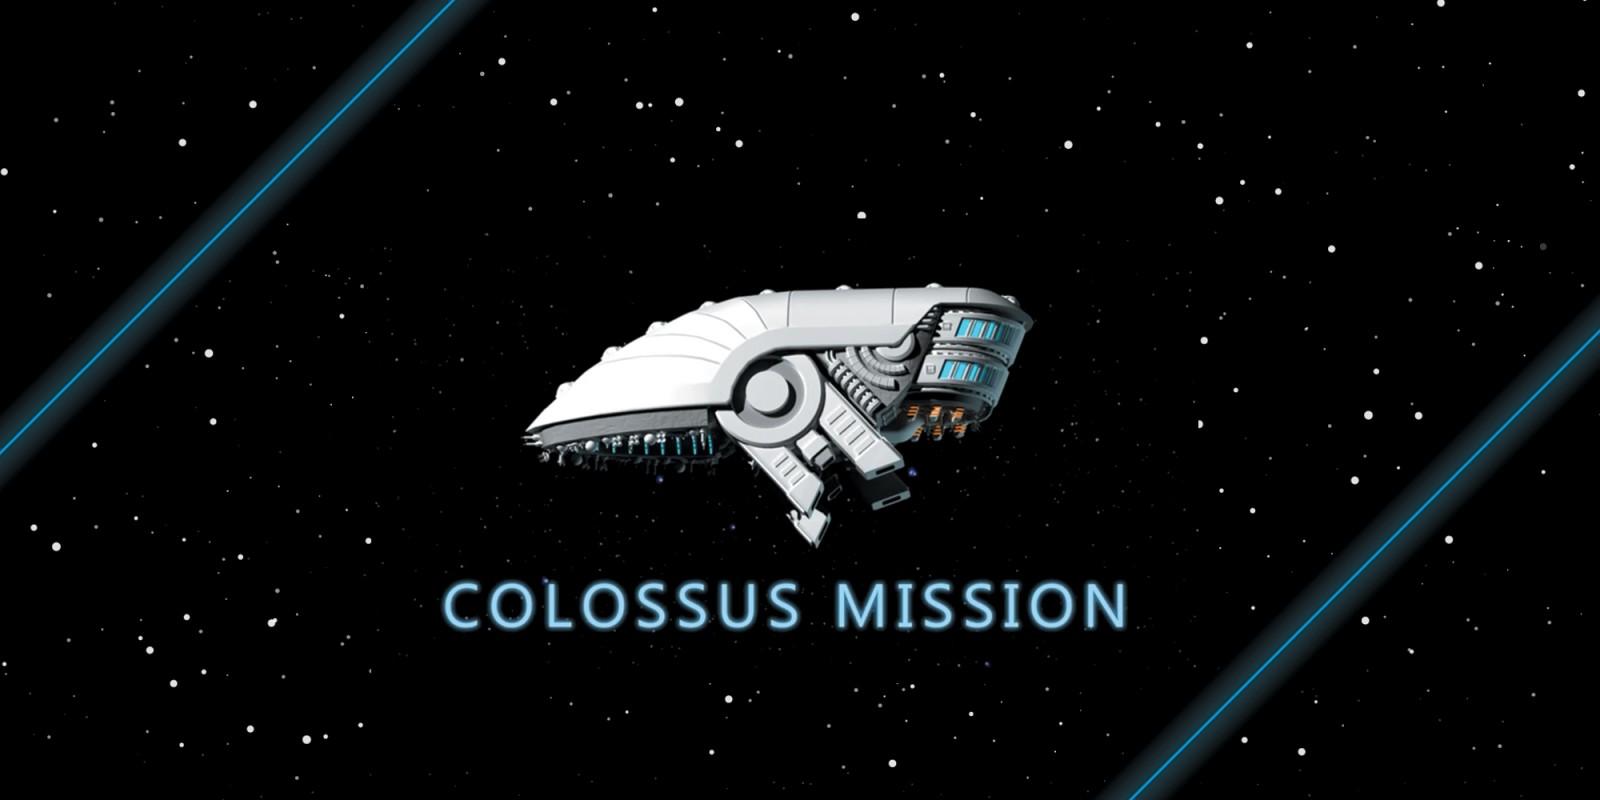 Colossus Mission